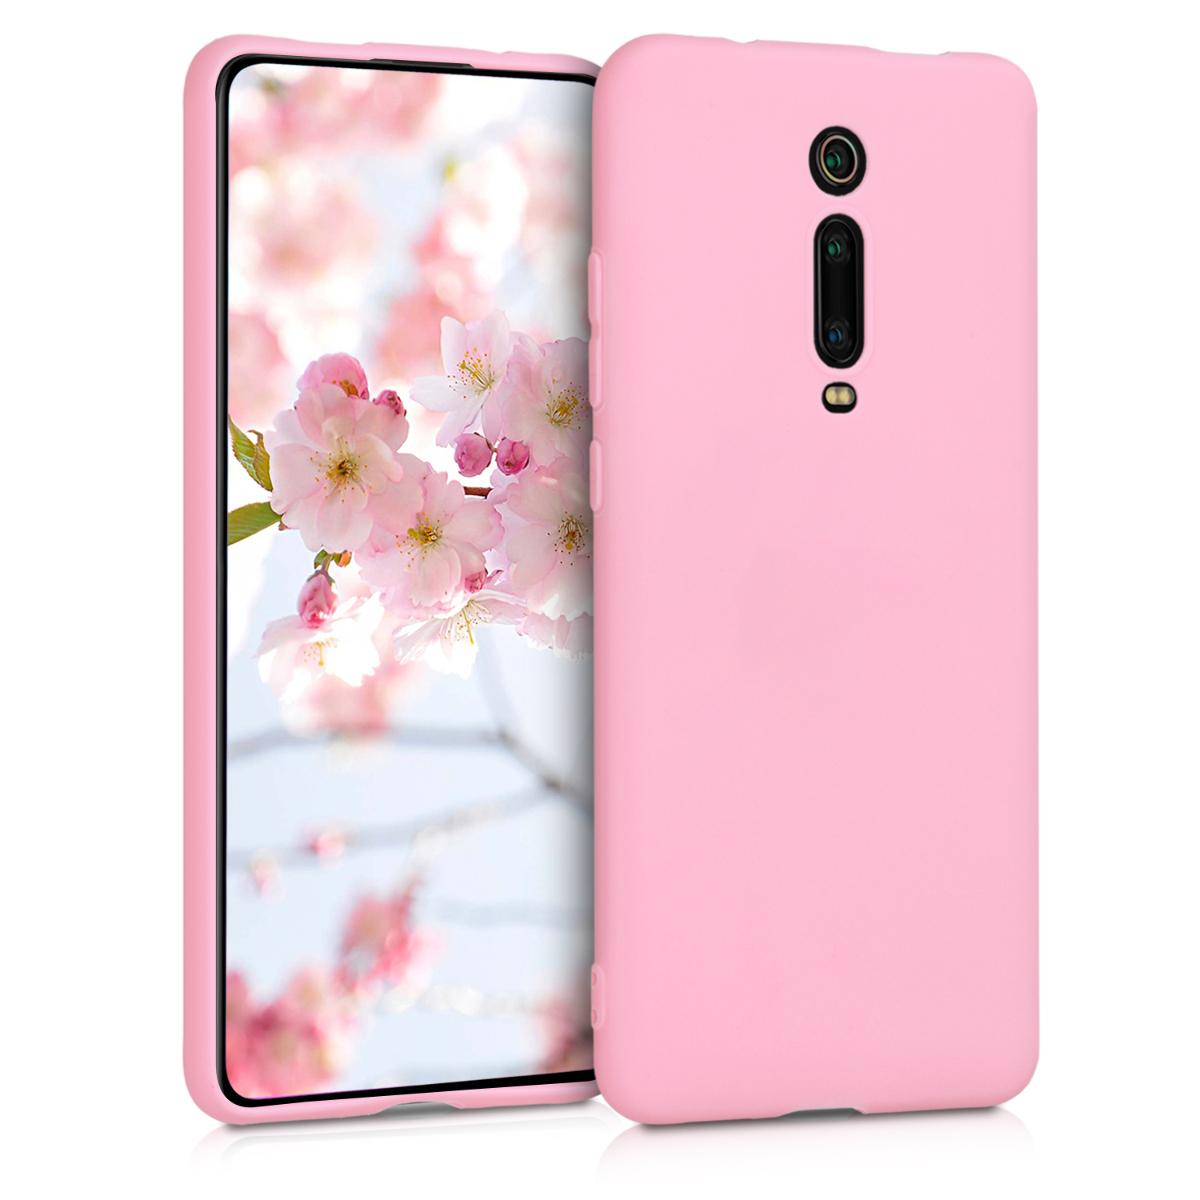 KW Θήκη Σιλικόνης Xiaomi Mi 9T (Pro) / Redmi K20 (Pro) - Soft Flexible Shock Absorbent - Light Pink Matte (49224.123)